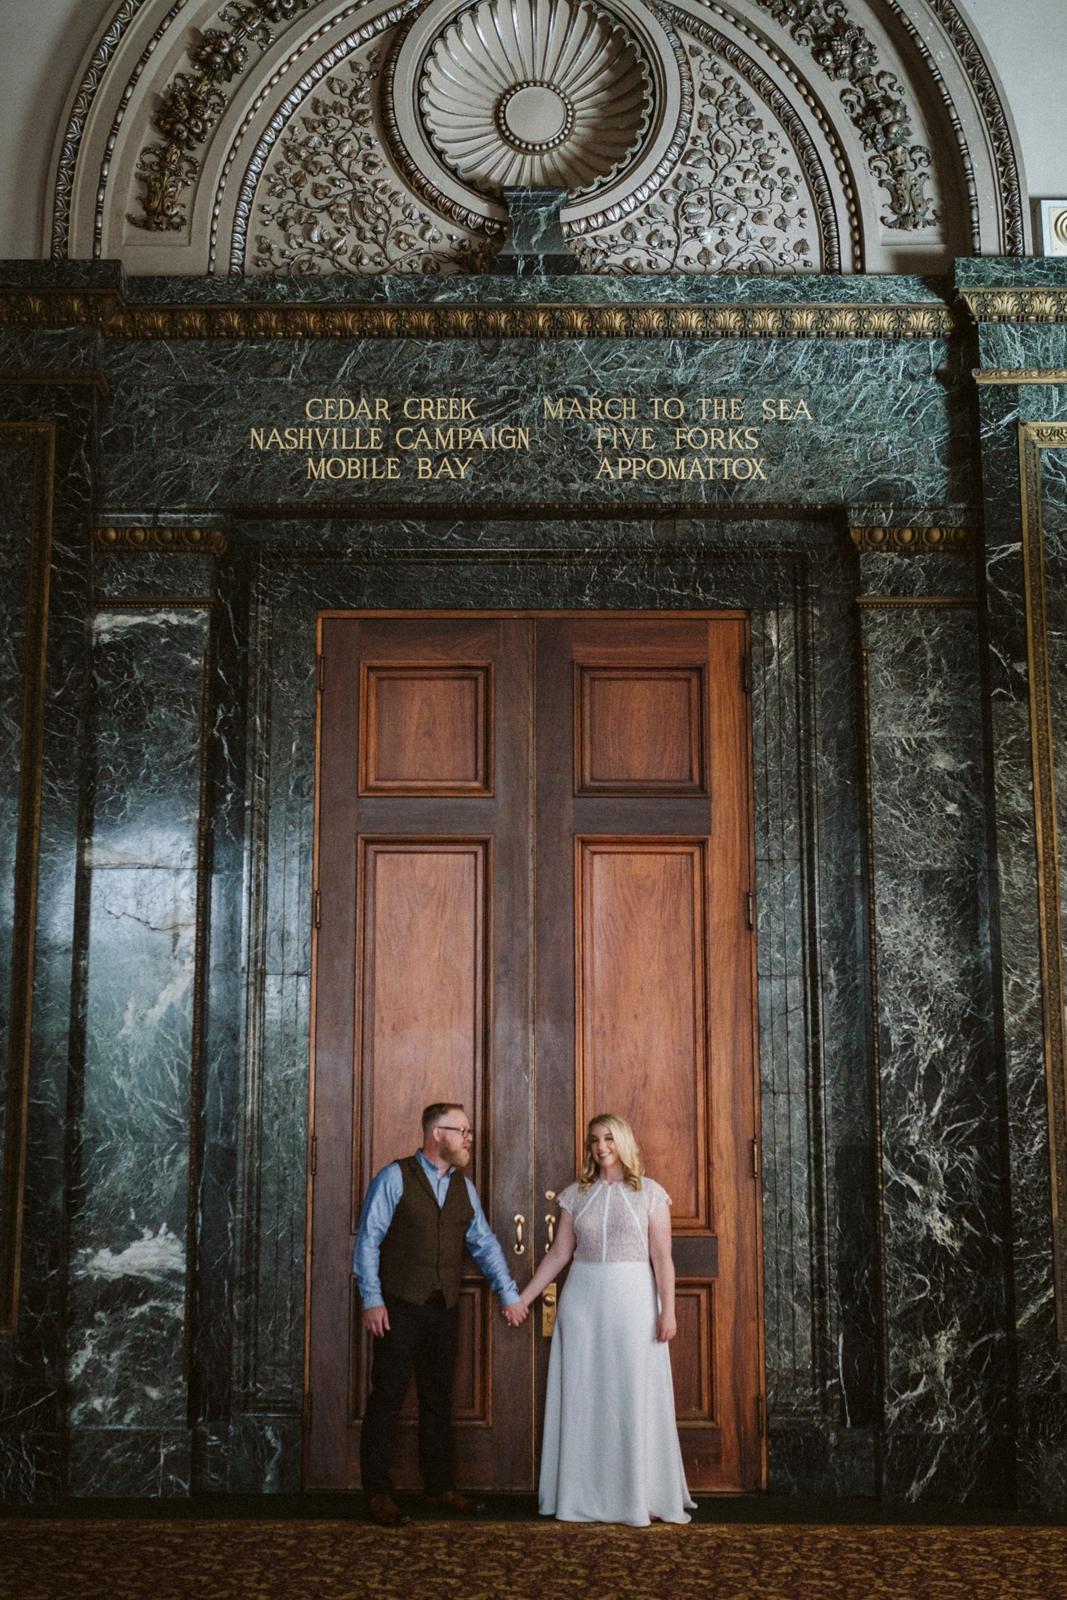 Chicago Cultural Center weddings   intimate wedding photographer   lisa kathan photography